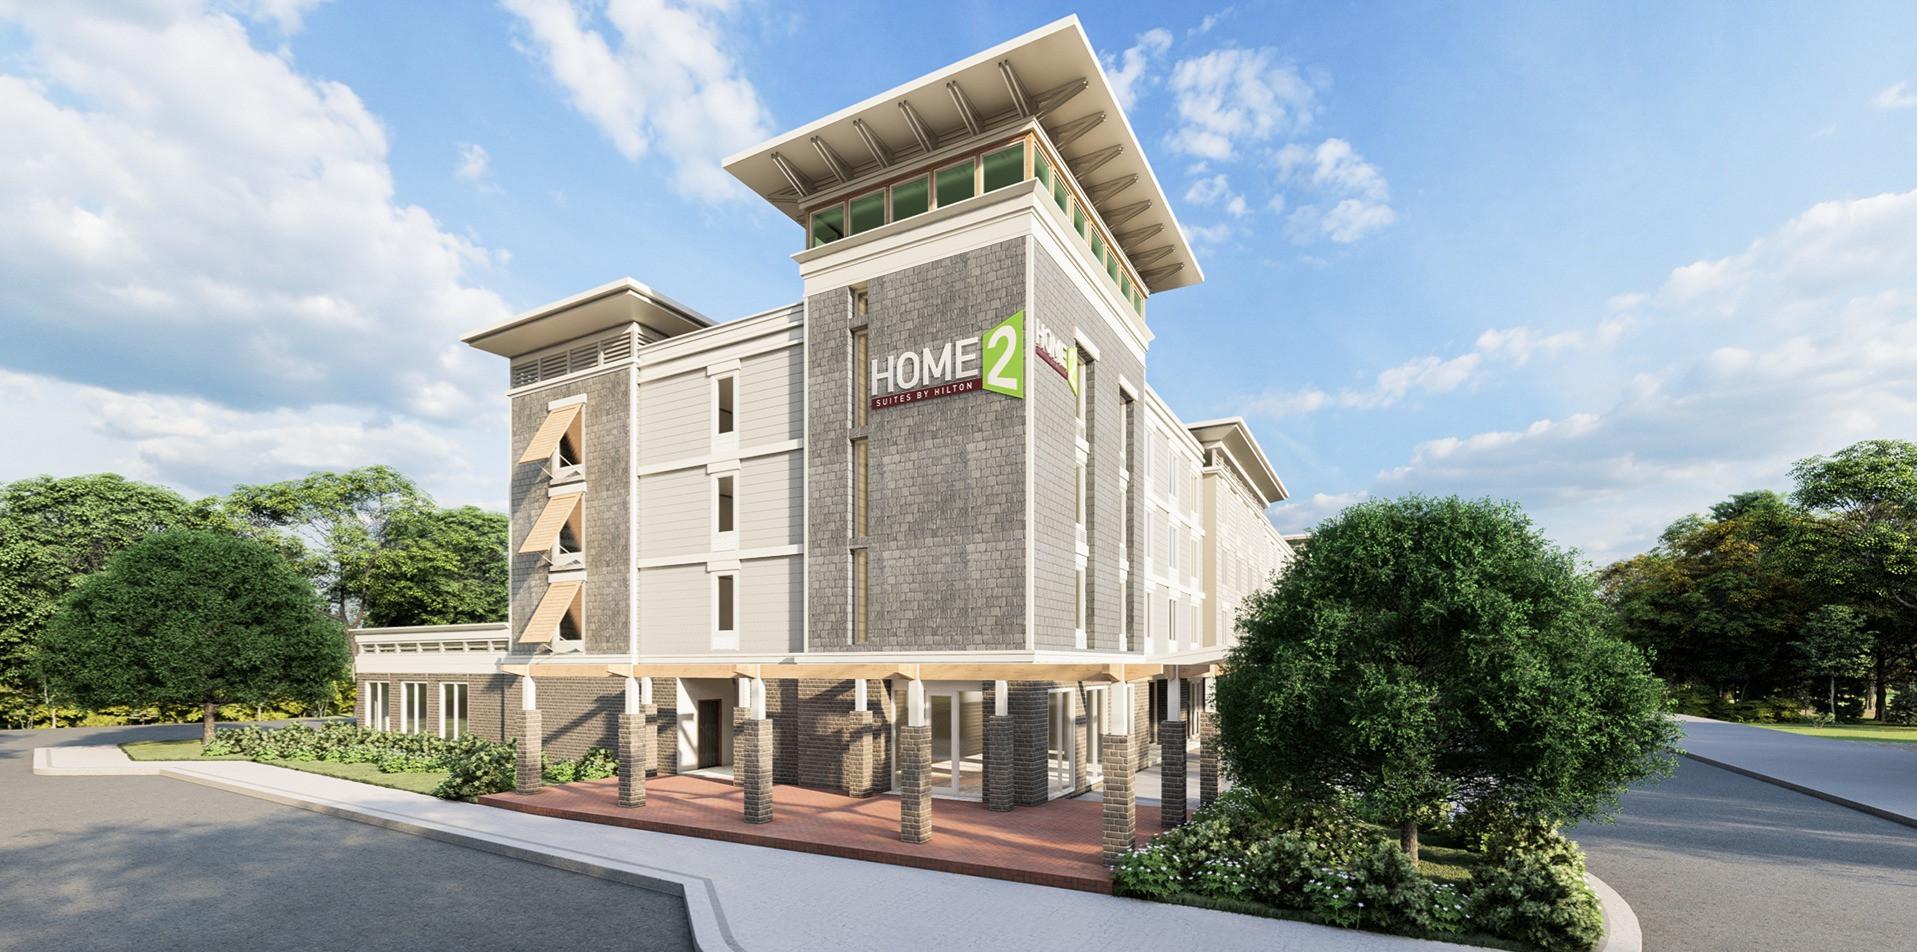 Home2 By Hilton - Okatie